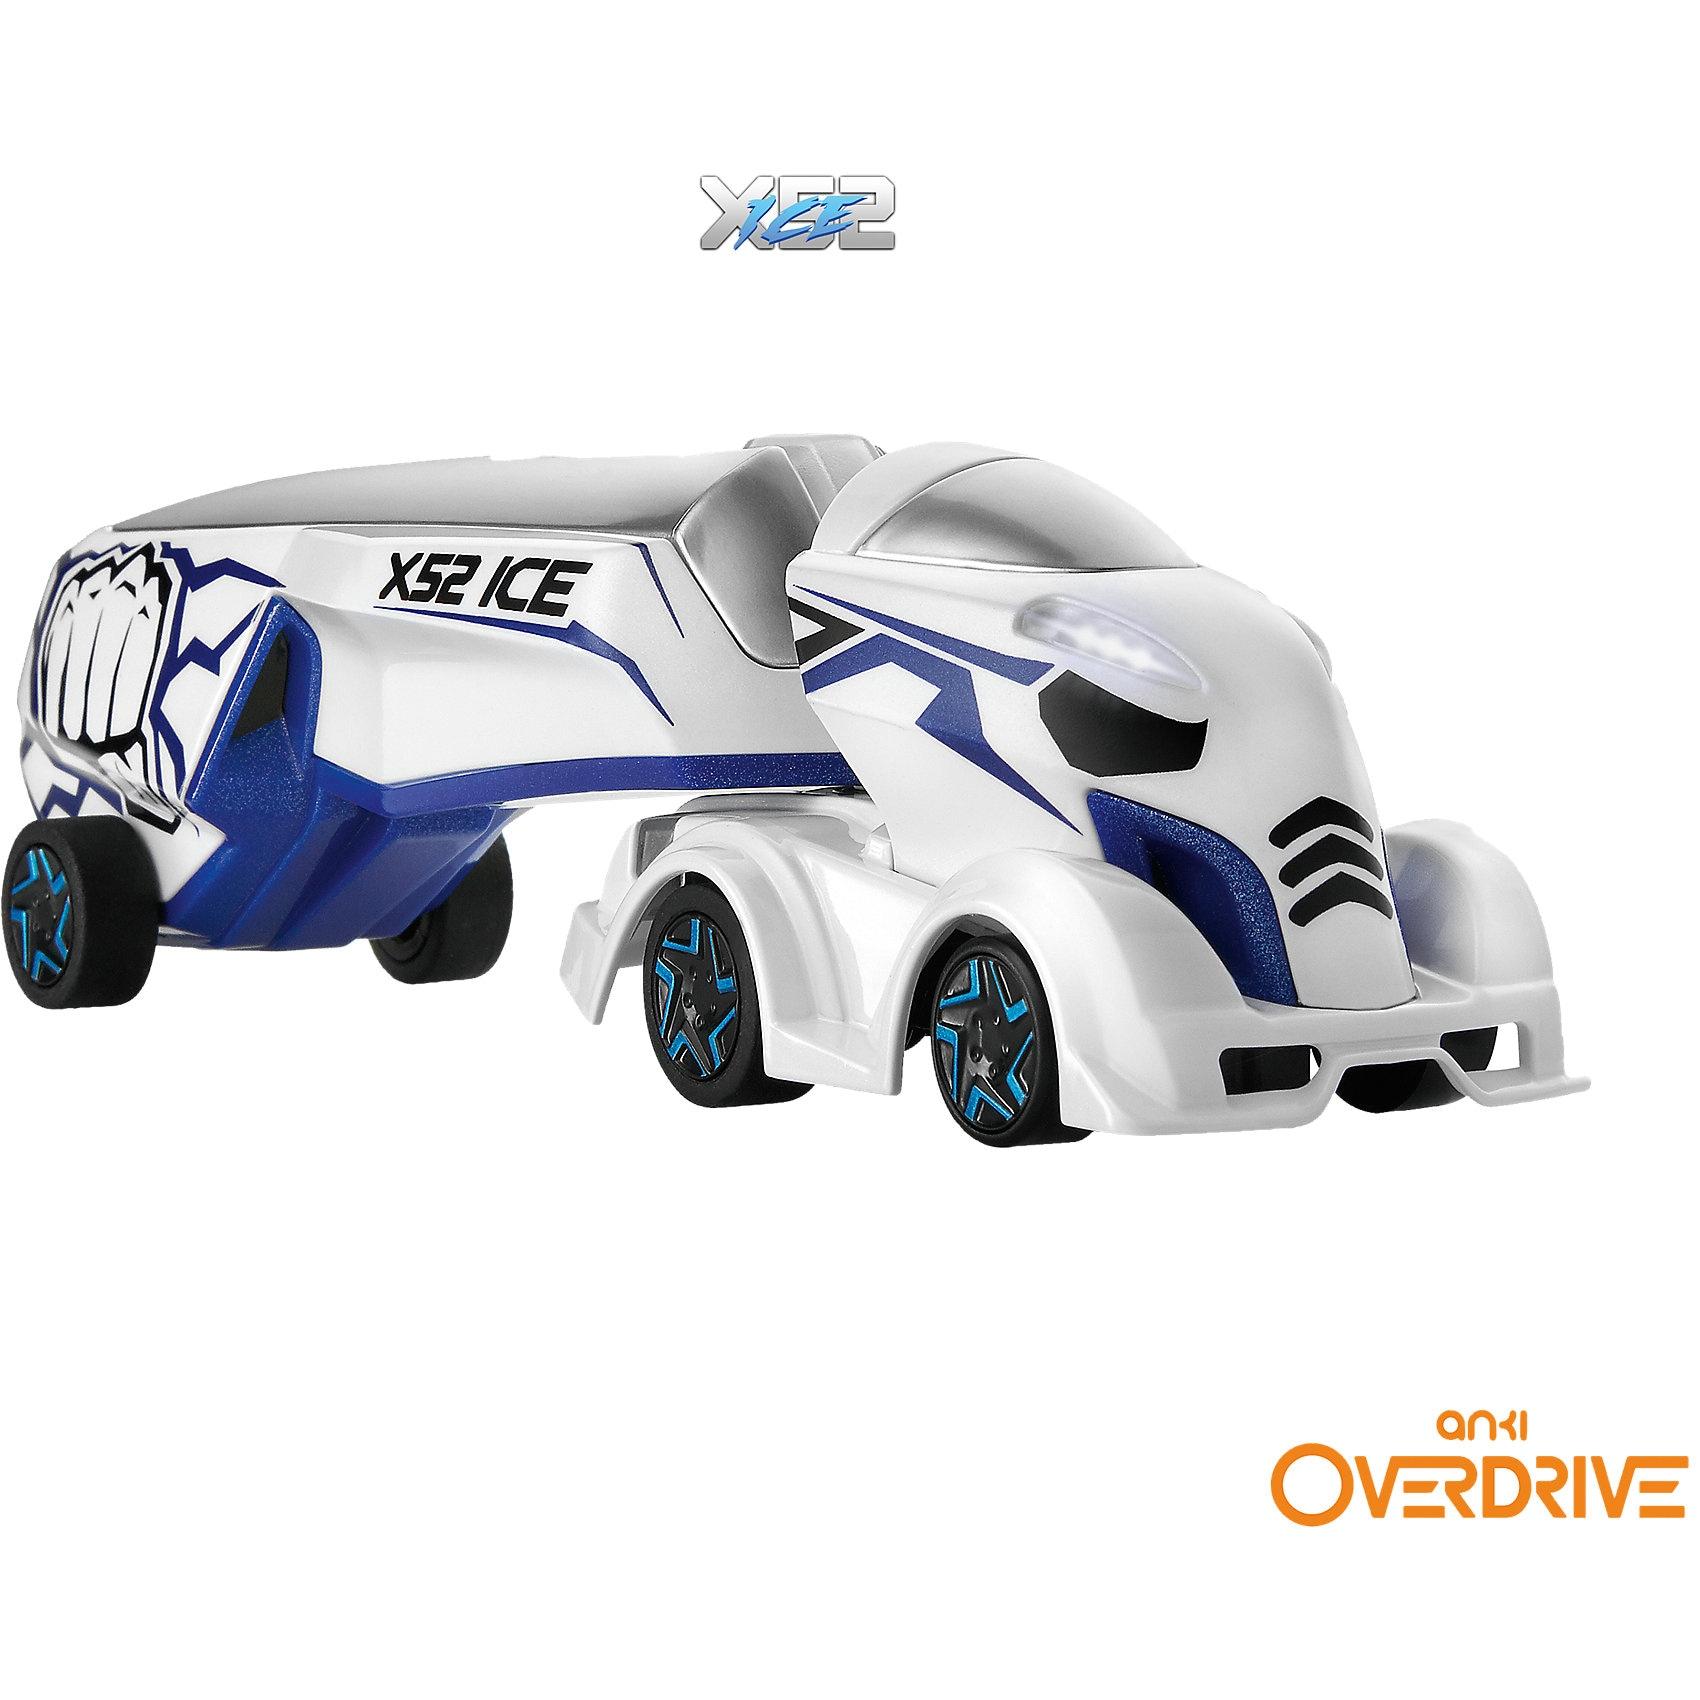 Anki Overdrive Supertruck X52 ICE